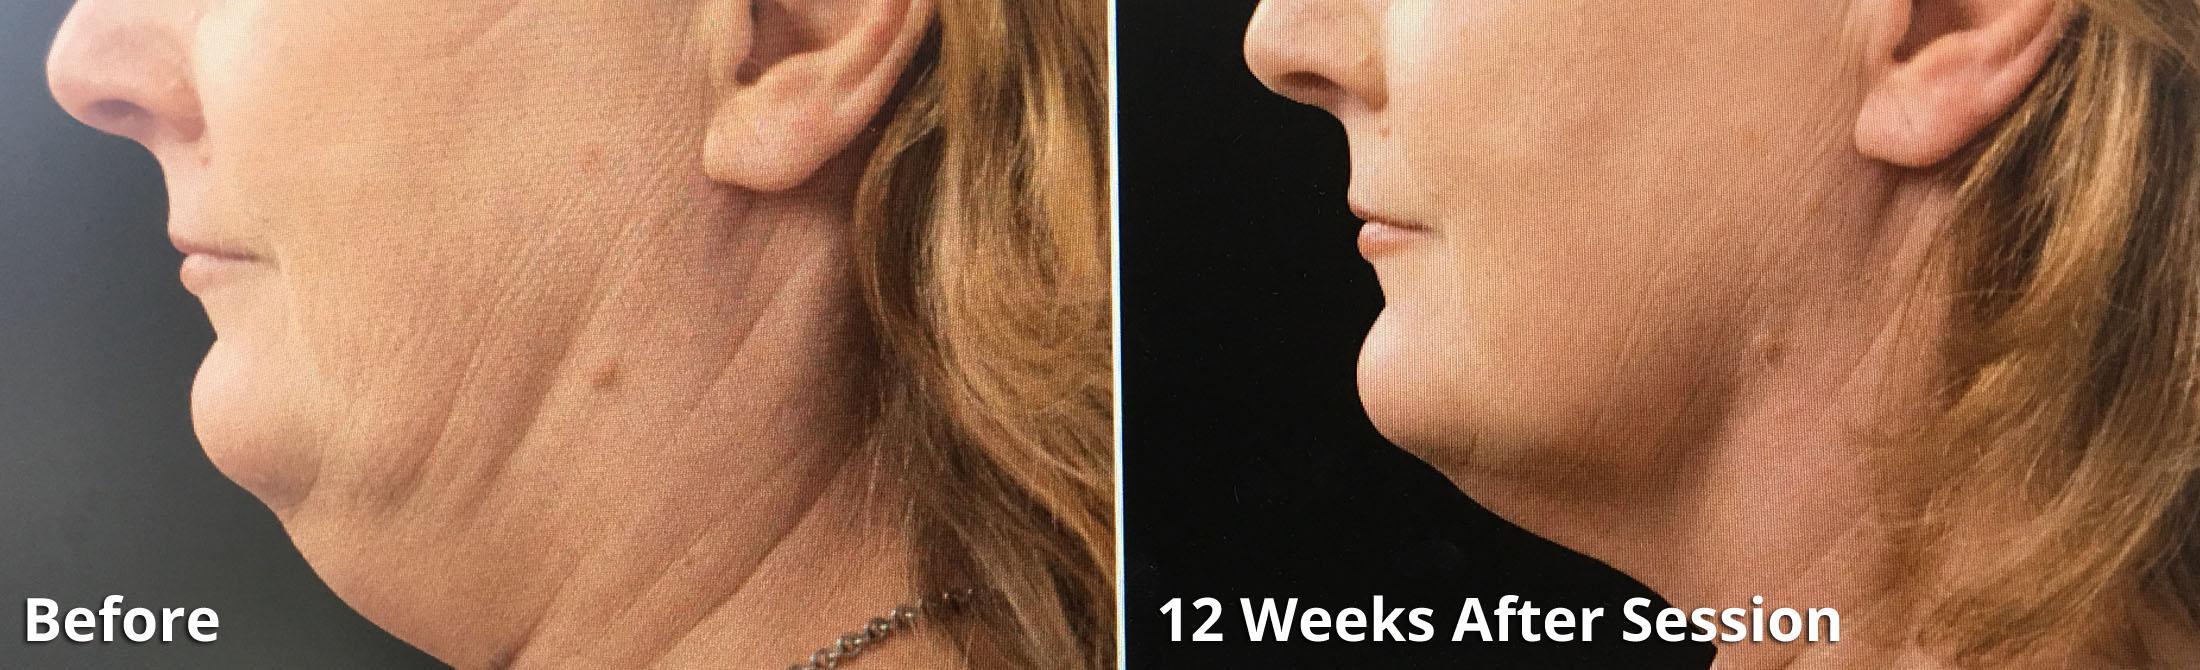 Coolsculpting - Non-surgical Facial fat reduction